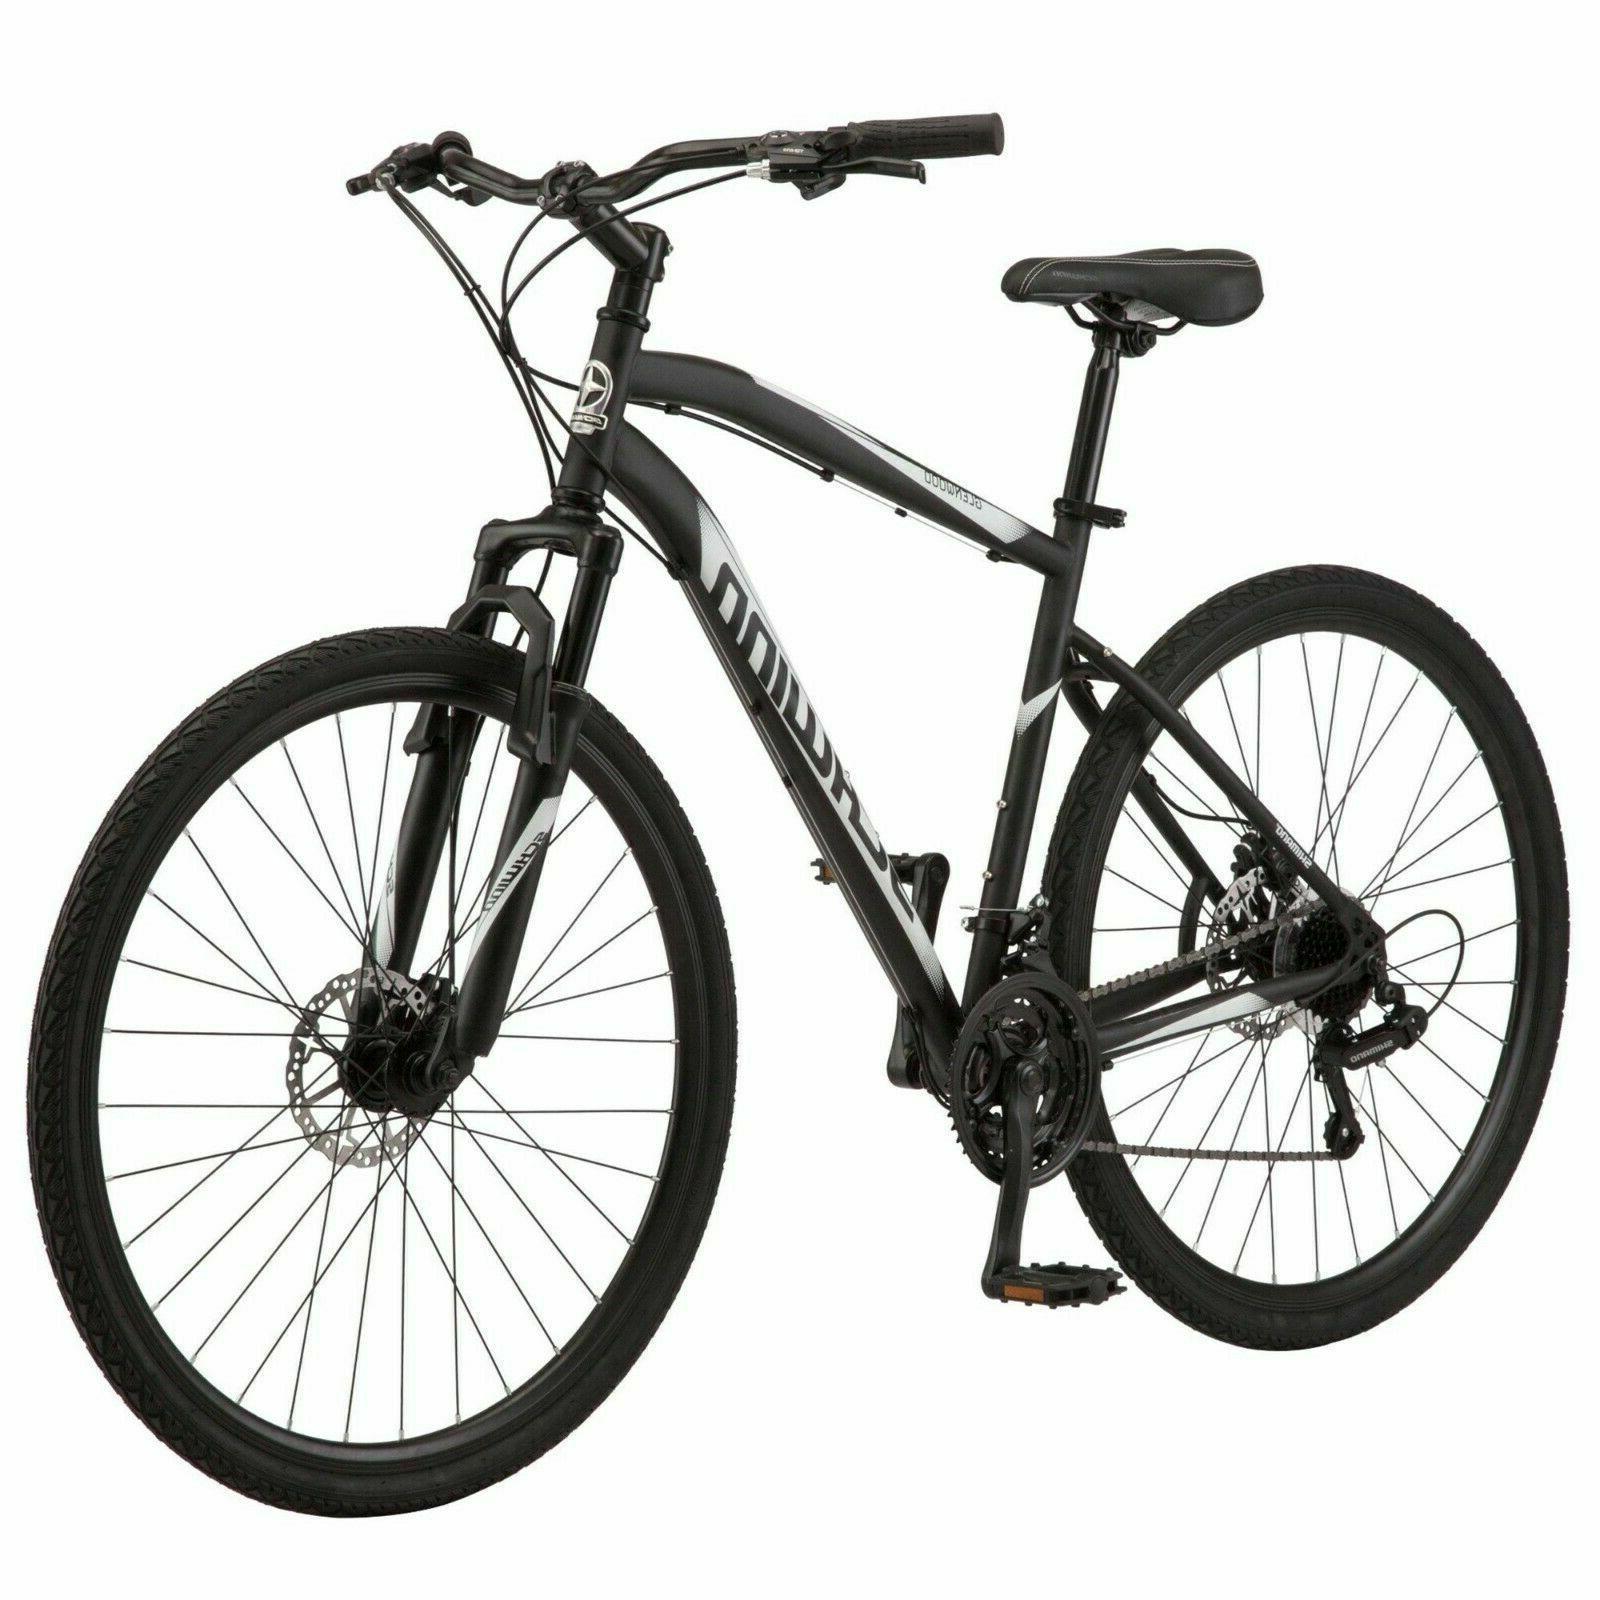 brand new glenwood hybrid bike 21 speed